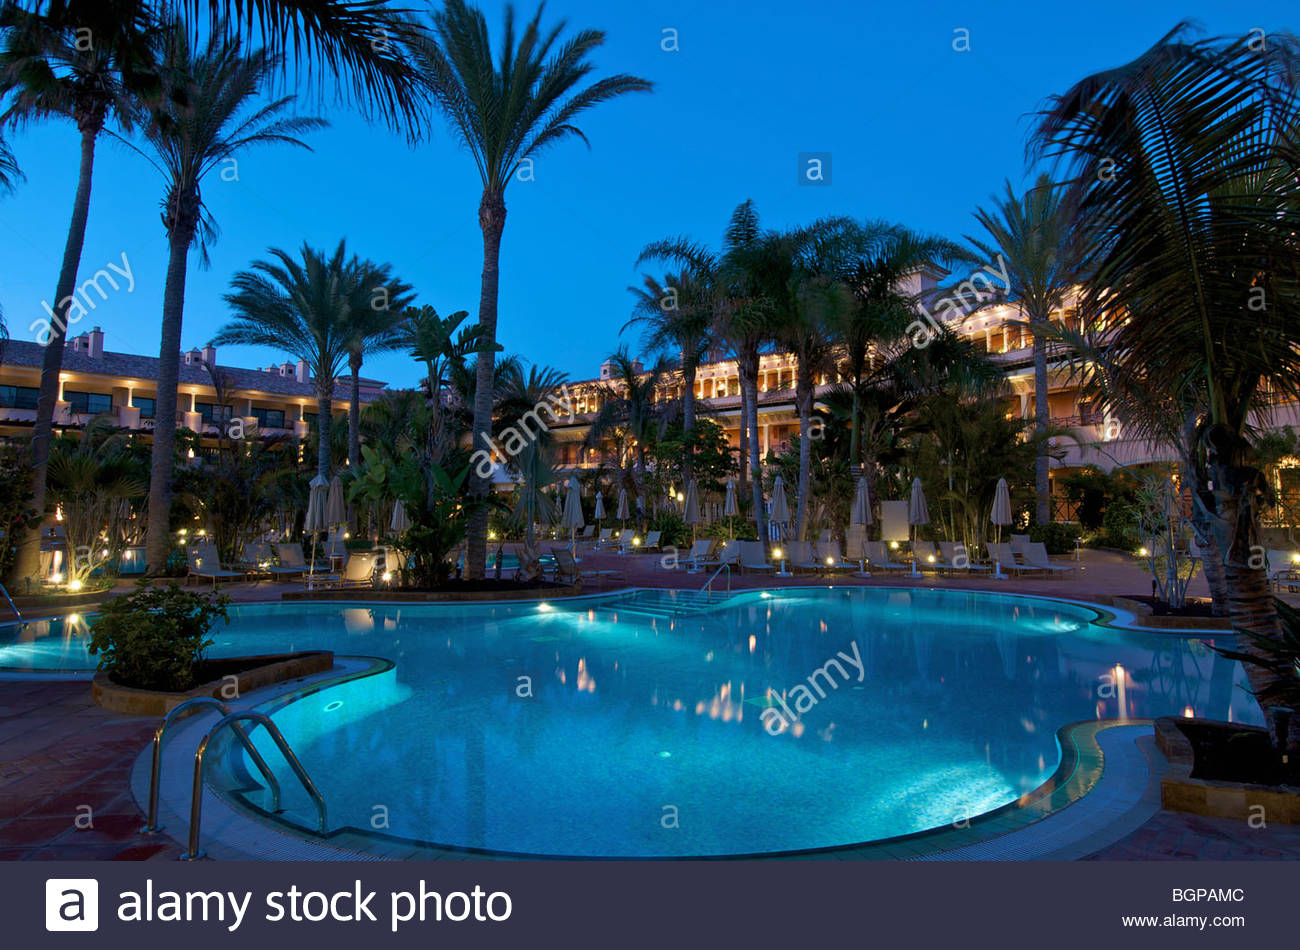 gran hotel atlantis bahia real fuerteventura canary islands spain stock photo royalty free. Black Bedroom Furniture Sets. Home Design Ideas